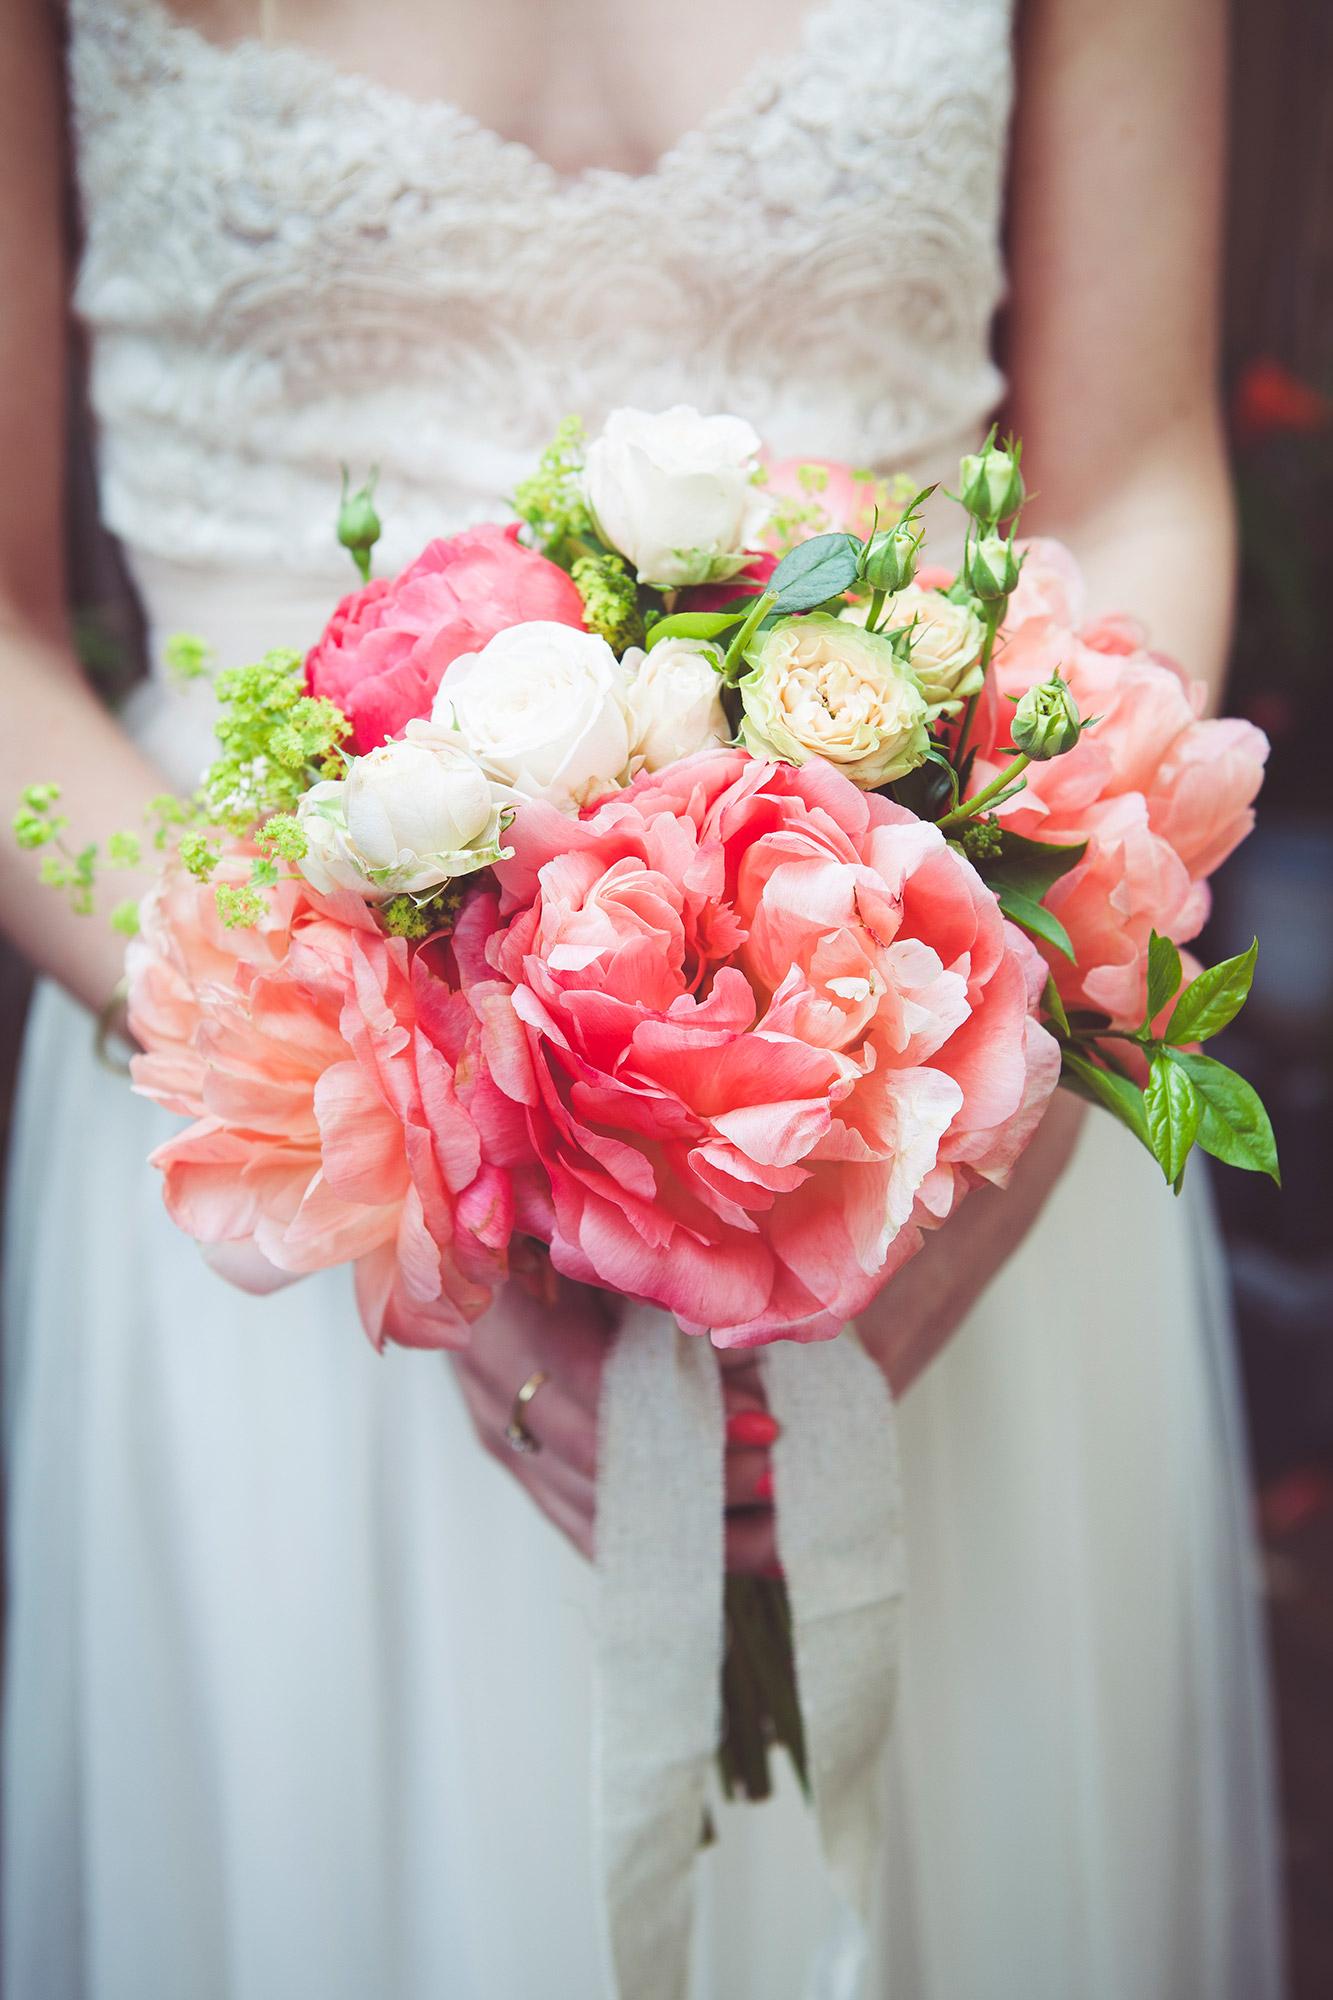 Bouquet at wedding at The Asylum, Peckham